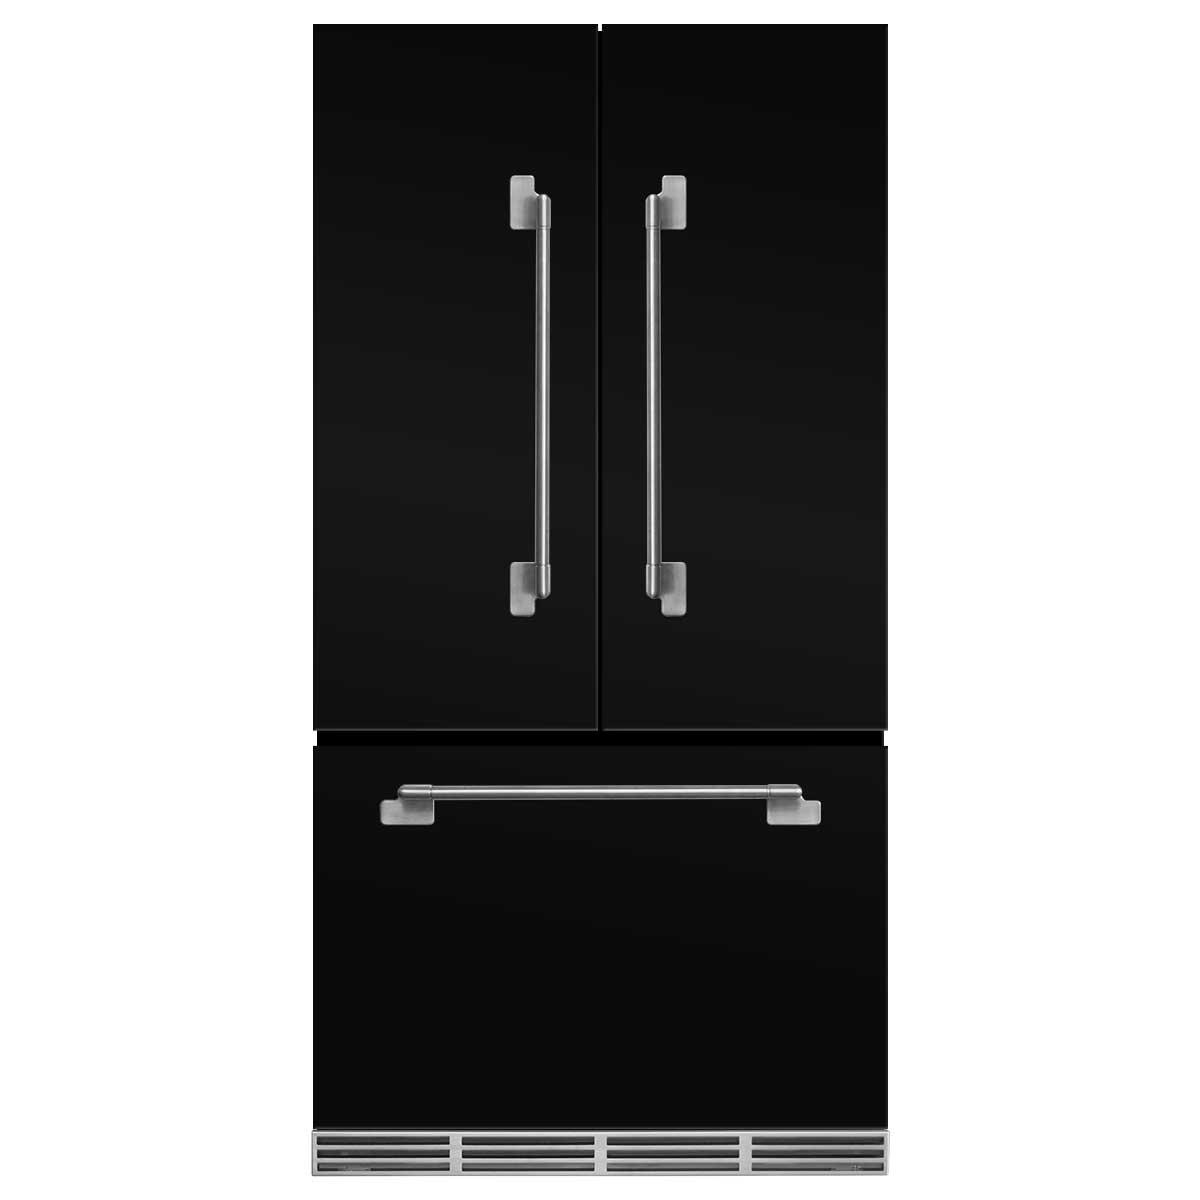 Aga Marvel Elise French Door Counter-Depth Refrigerator